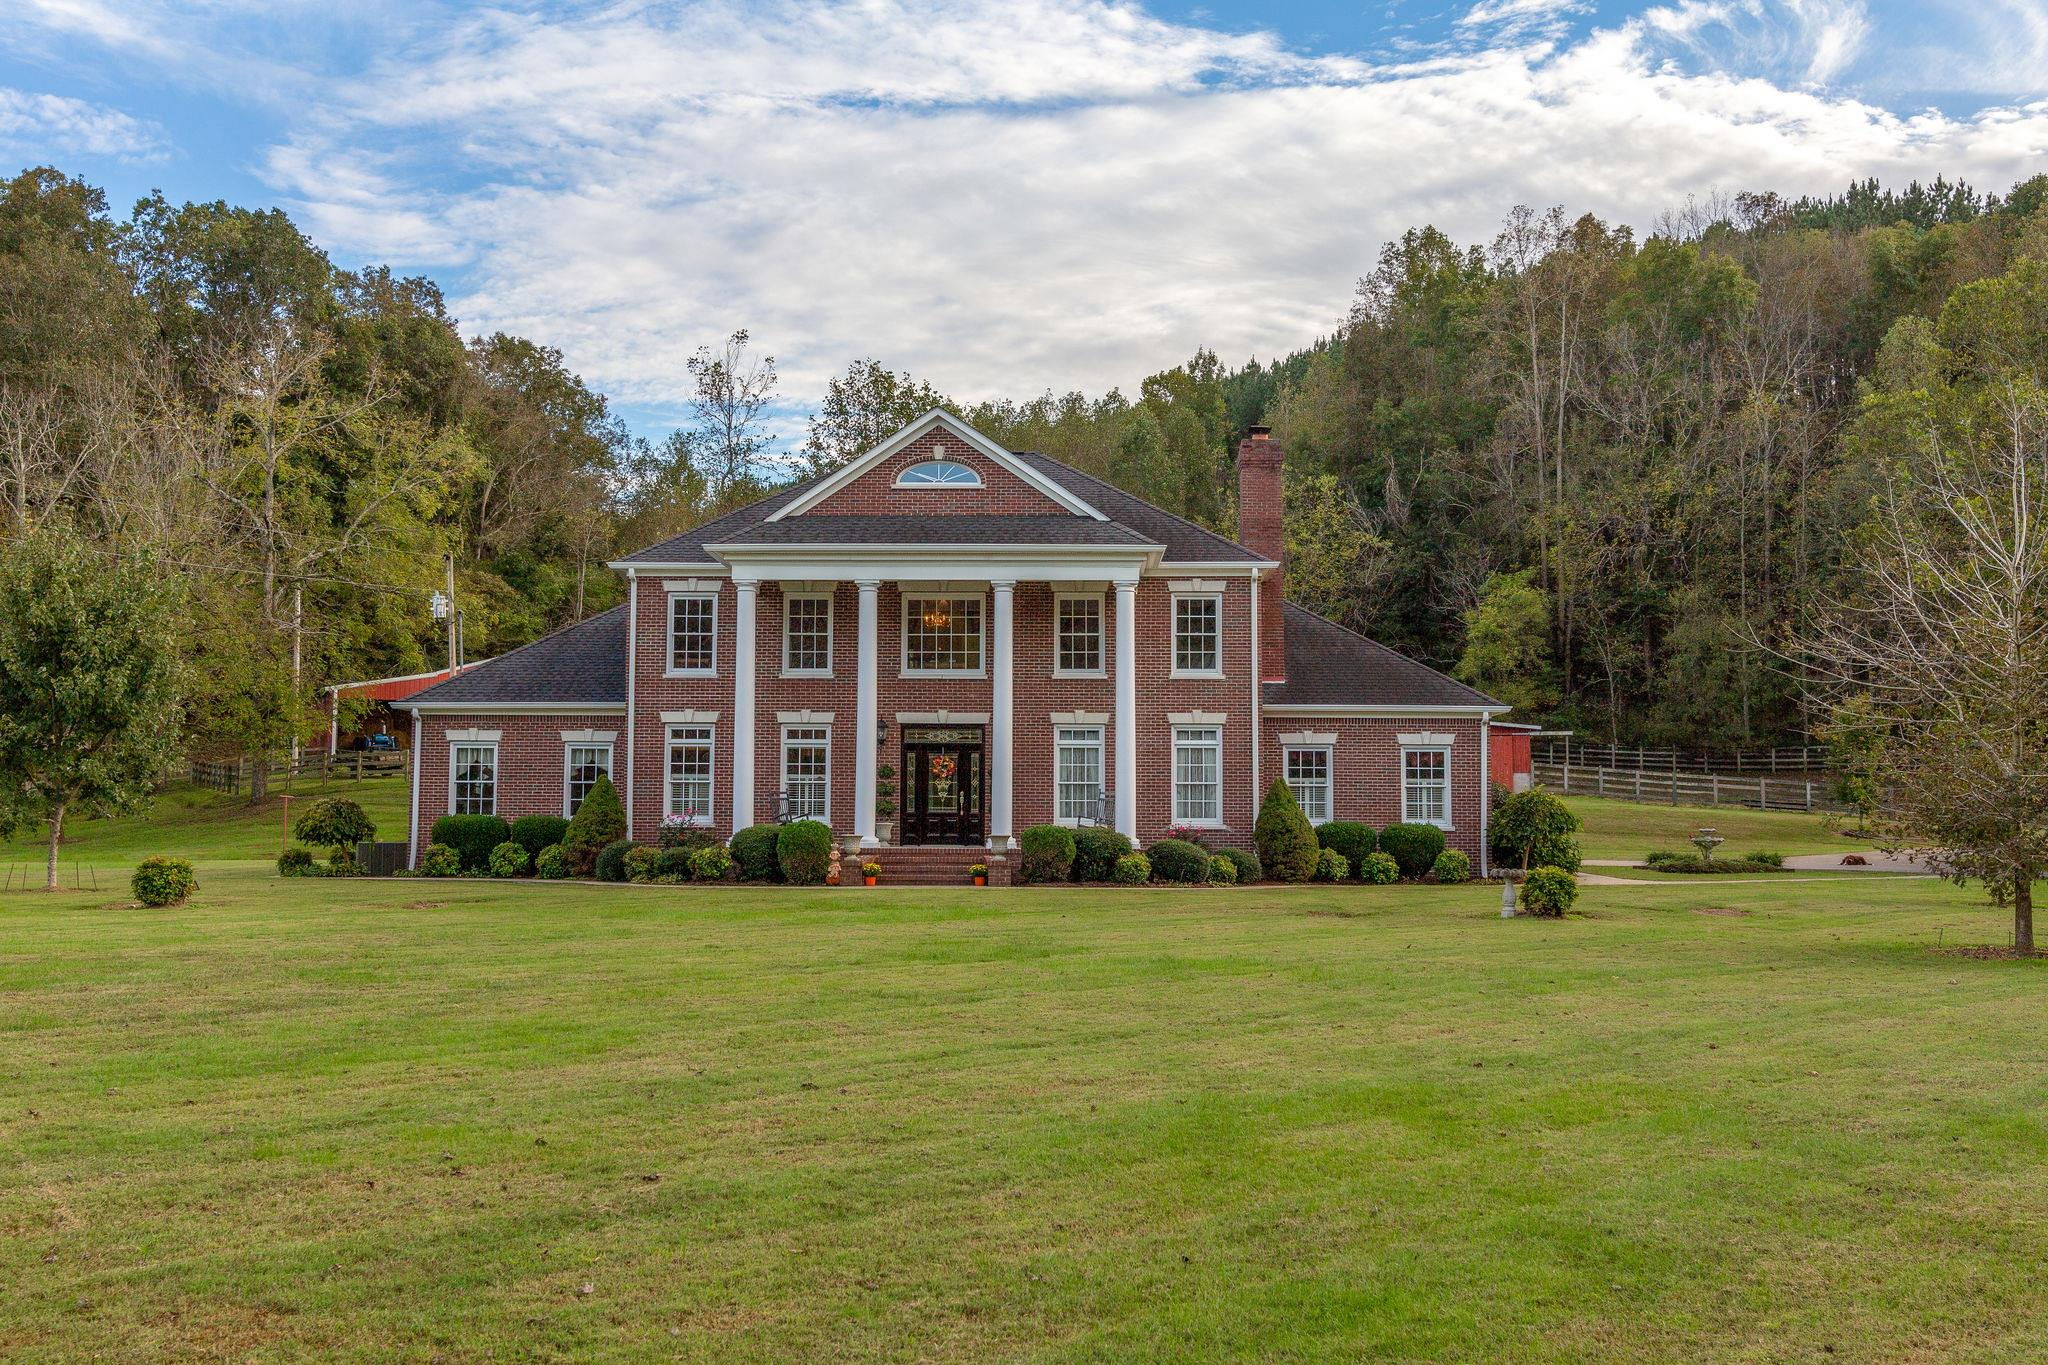 1309 Factory Creek Rd, Ethridge, TN 38456 - Ethridge, TN real estate listing